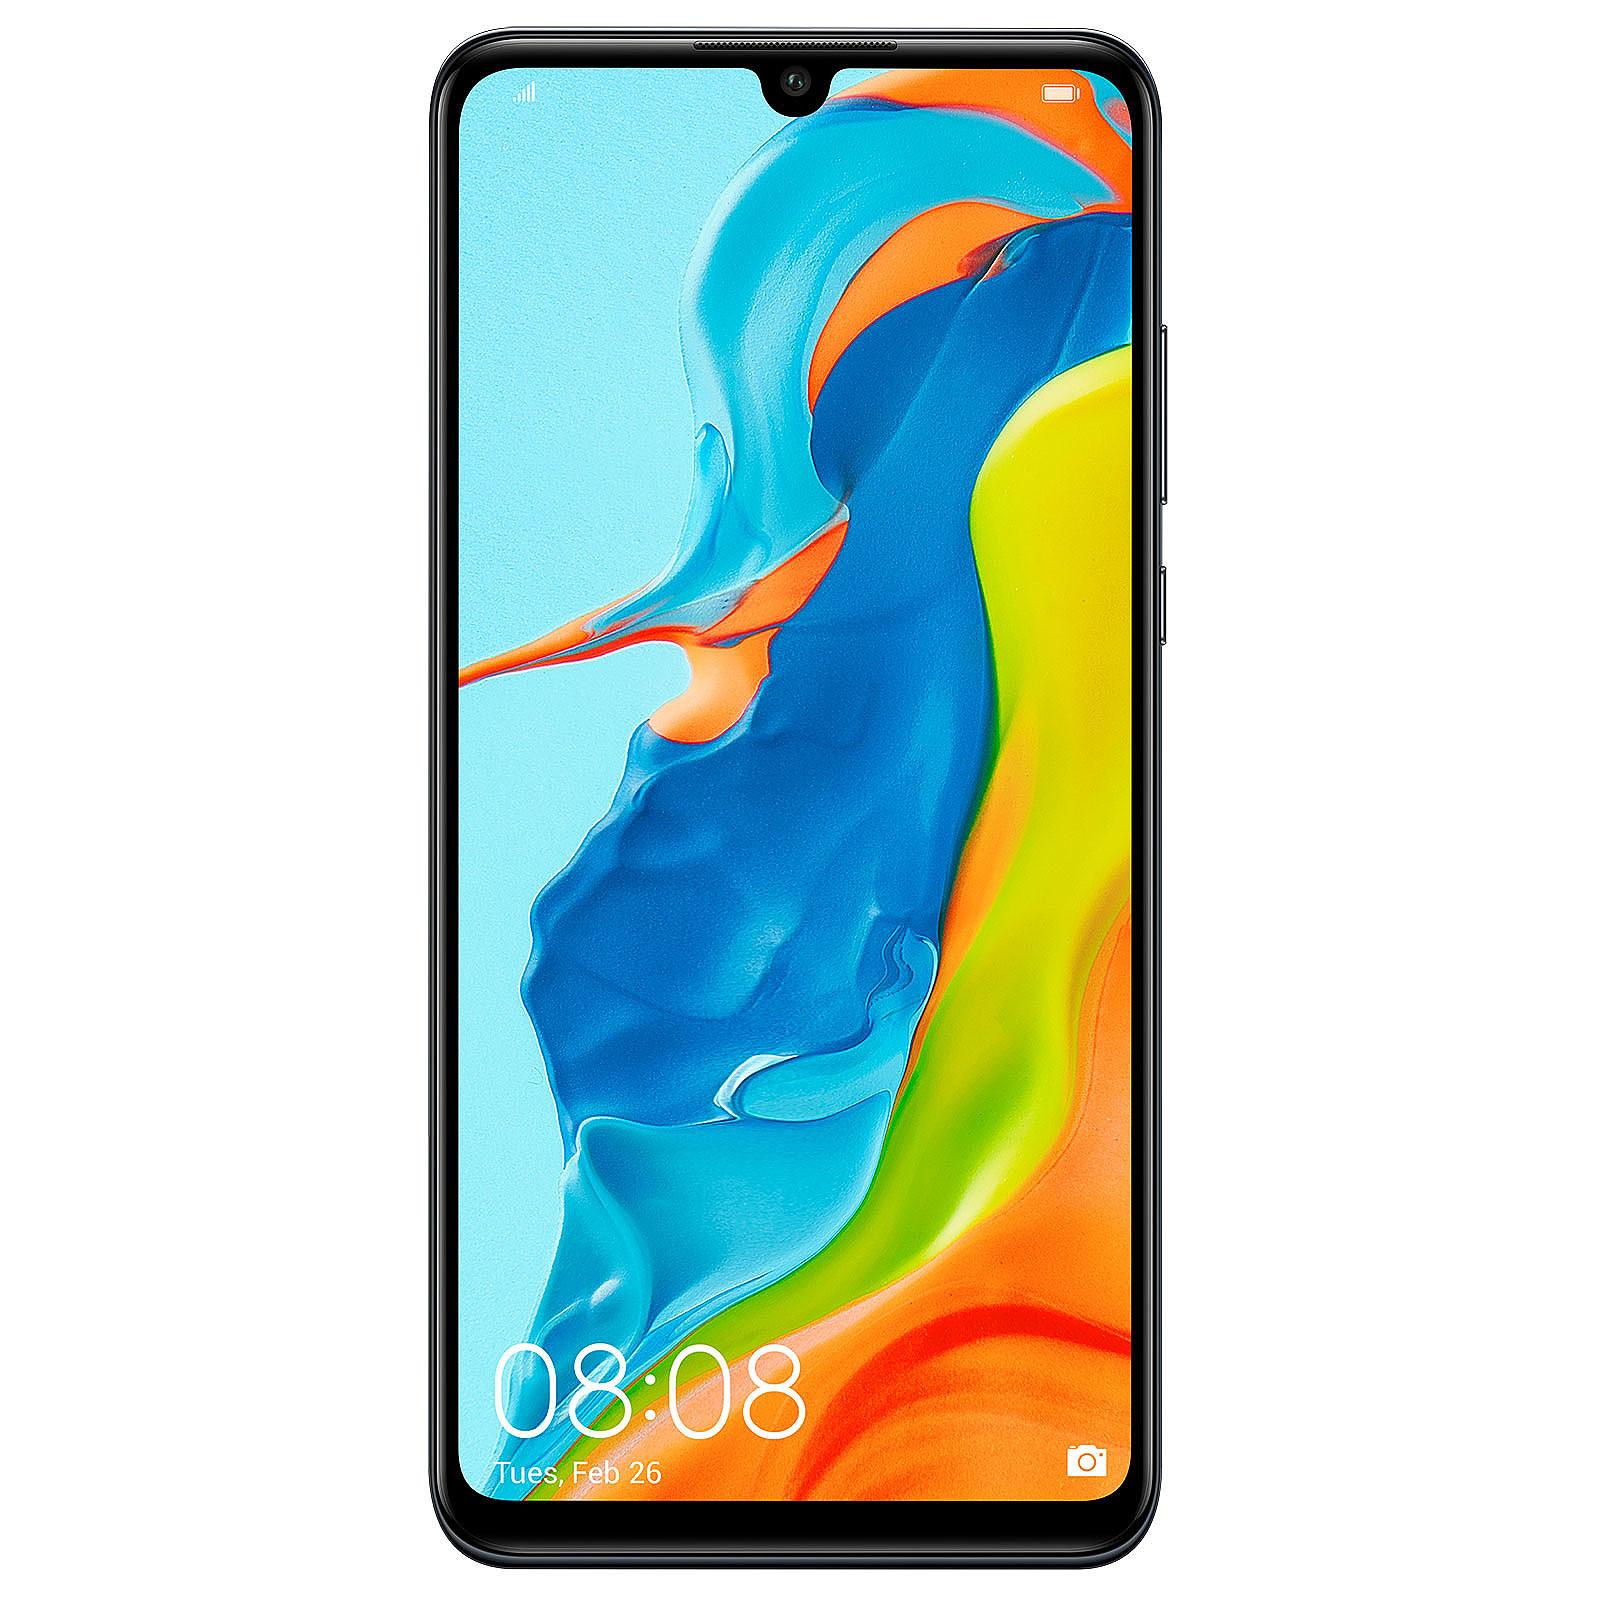 "Smartphone 6.15"" Huawei P30 Lite (B20) Noir - Full HD+, Kirin 710, RAM 4 Go, ROM 128 Go (179.99€ avec le code BF19 + 18€ en SuperPoints)"